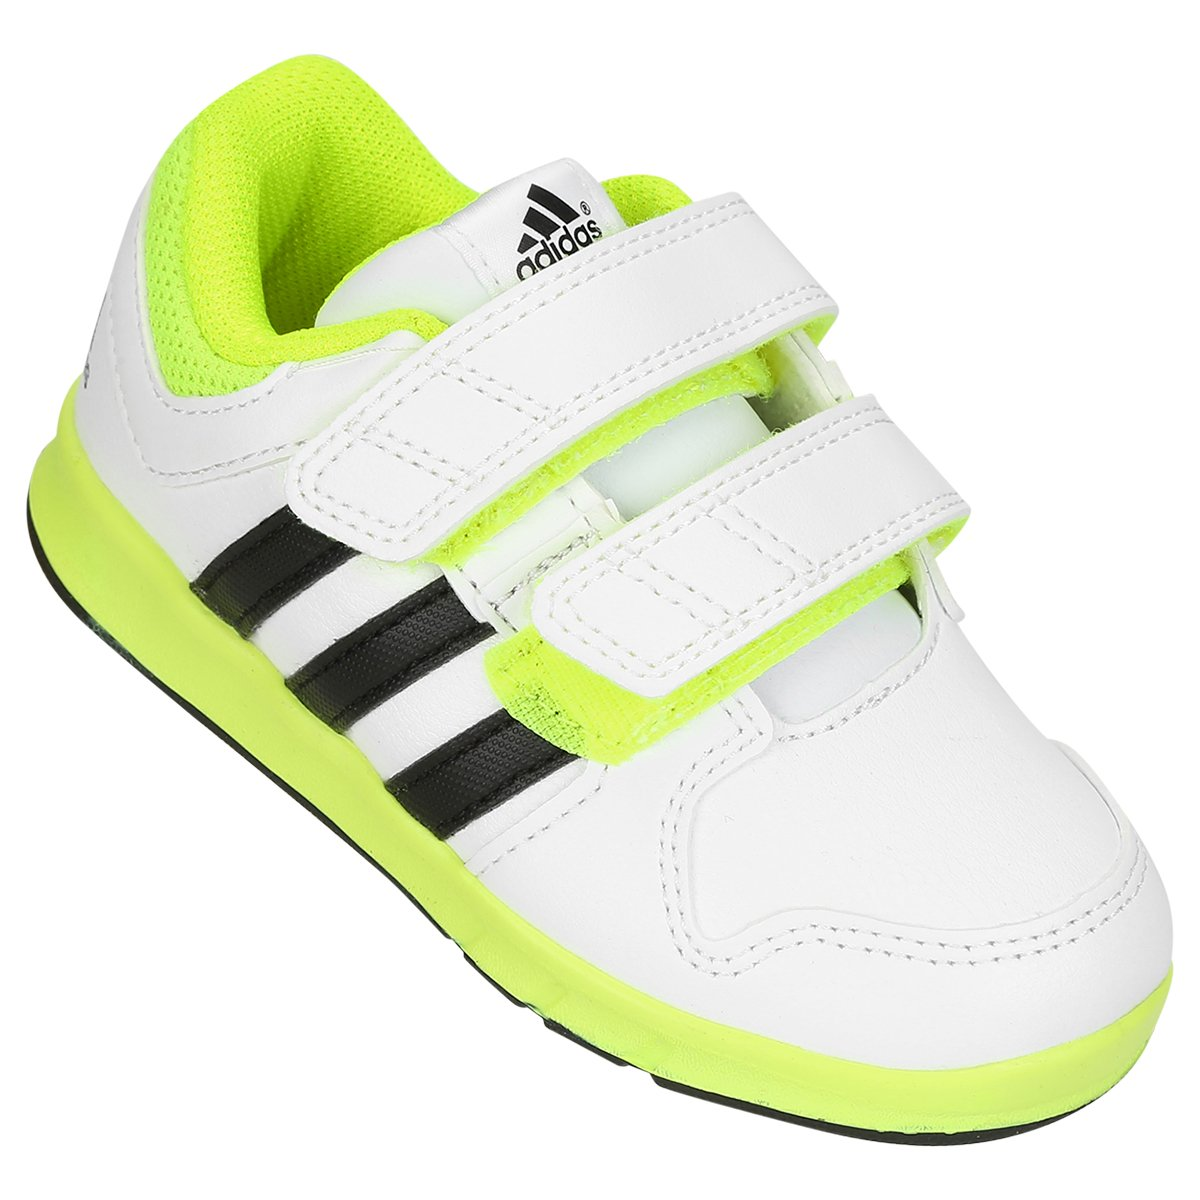 898f3bd930c Tênis Adidas Lk Trainer Infantil - Compre Agora